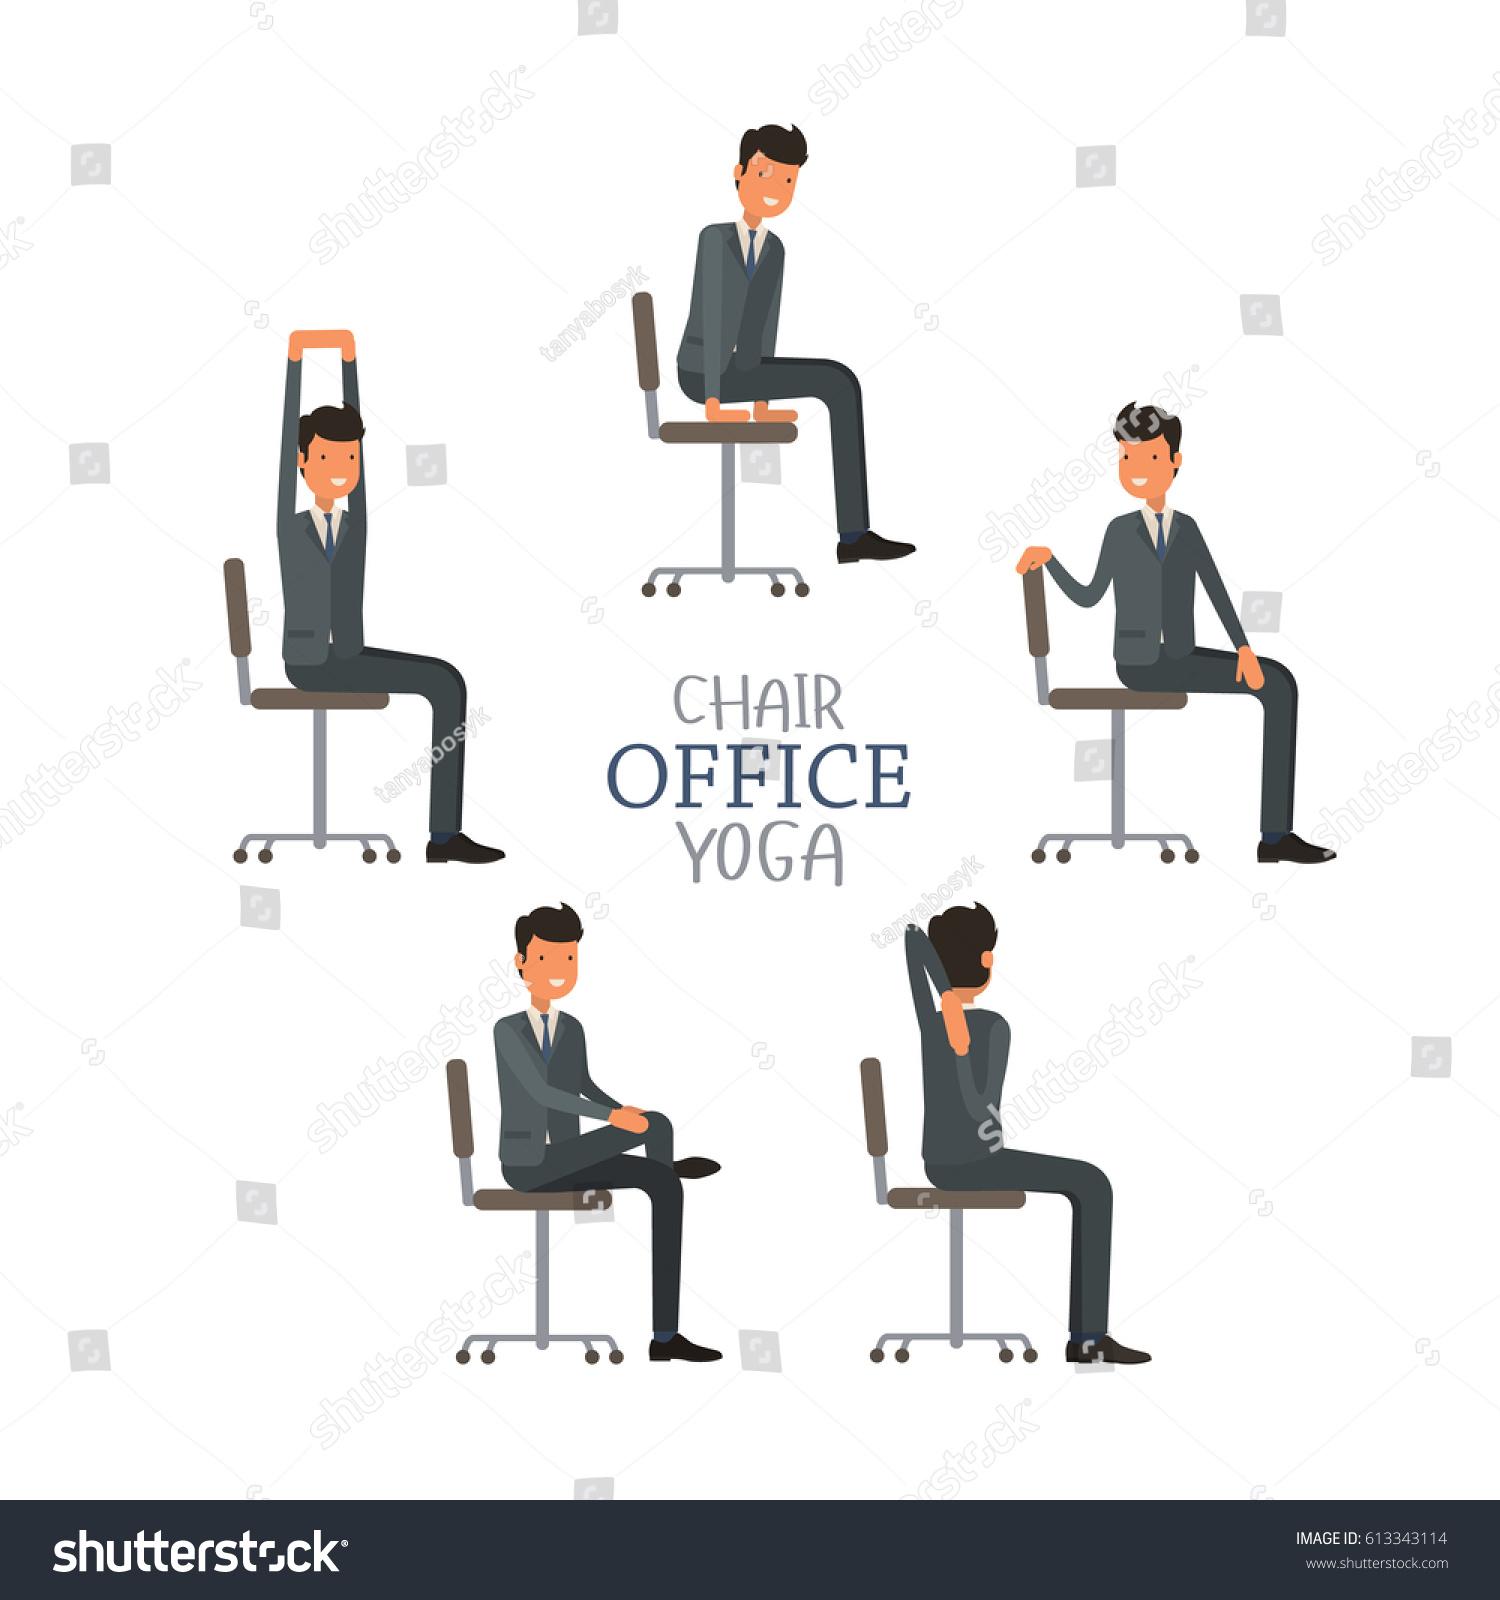 Vector Illustration Office Chair Yoga Businessman Stock Vector Royalty Free 613343114